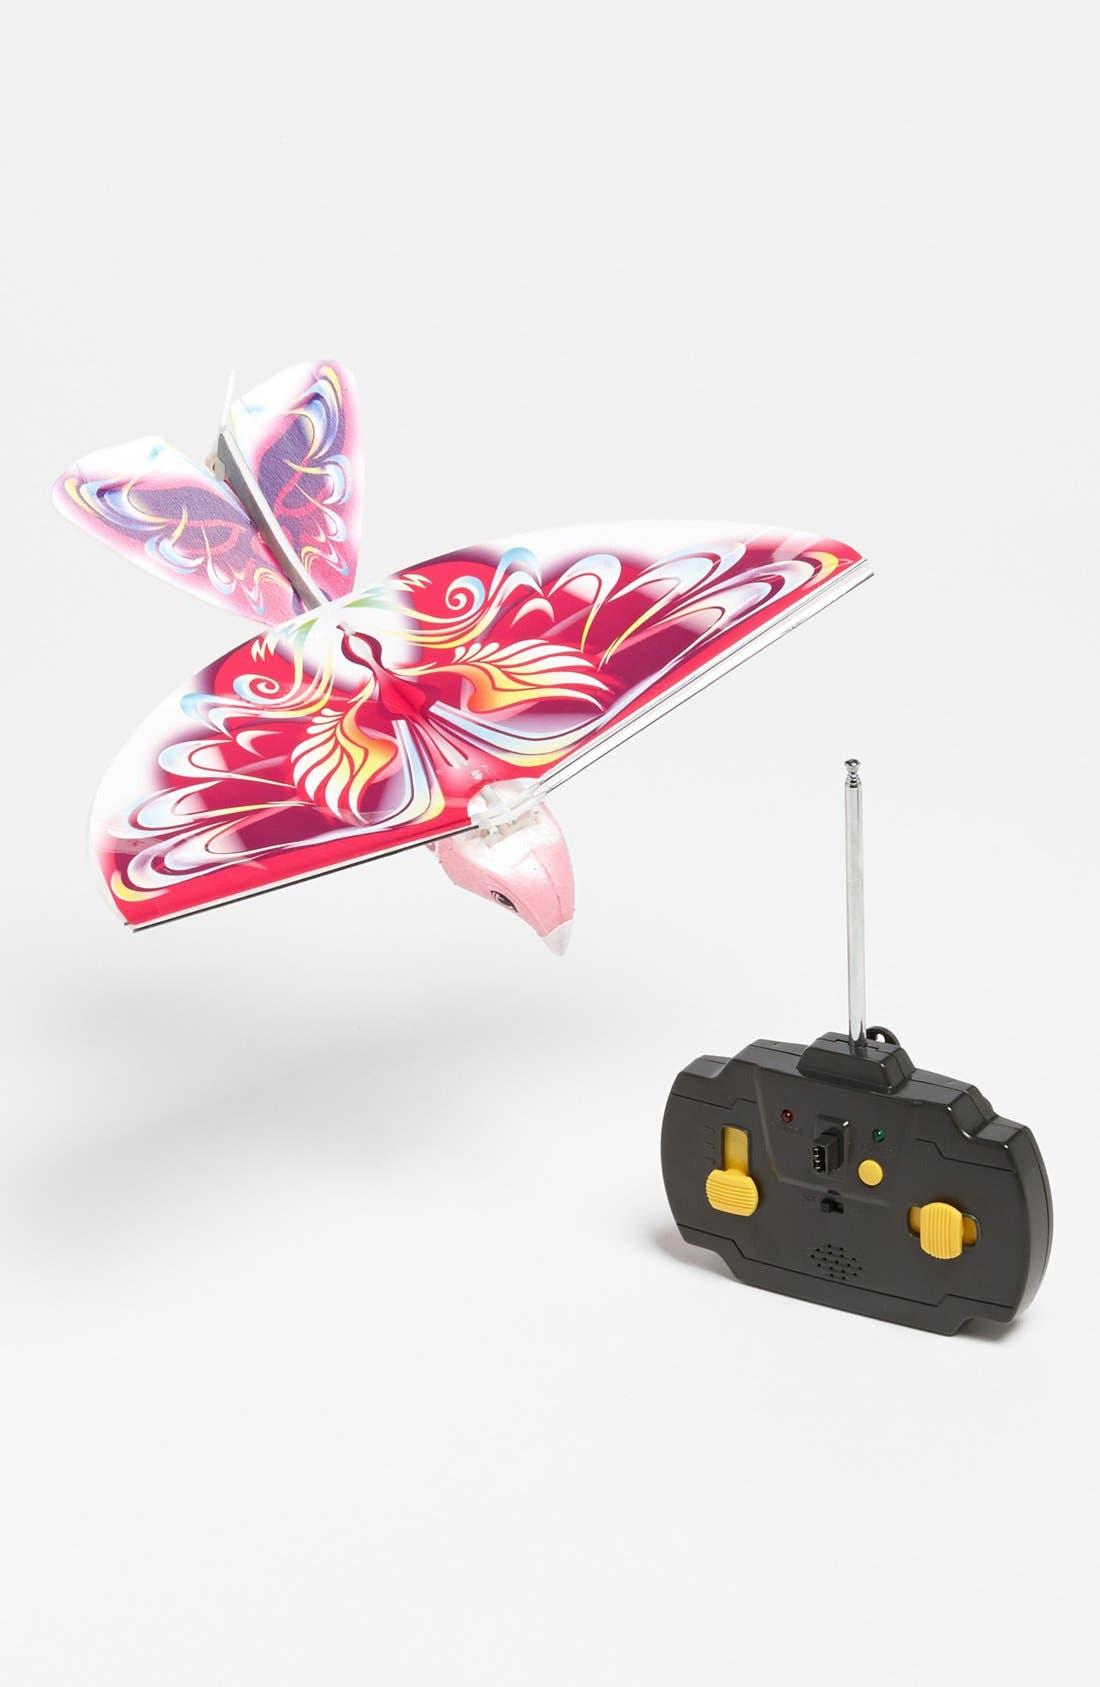 Alternate Image 1 Selected - MukikiM Remote Control Bird